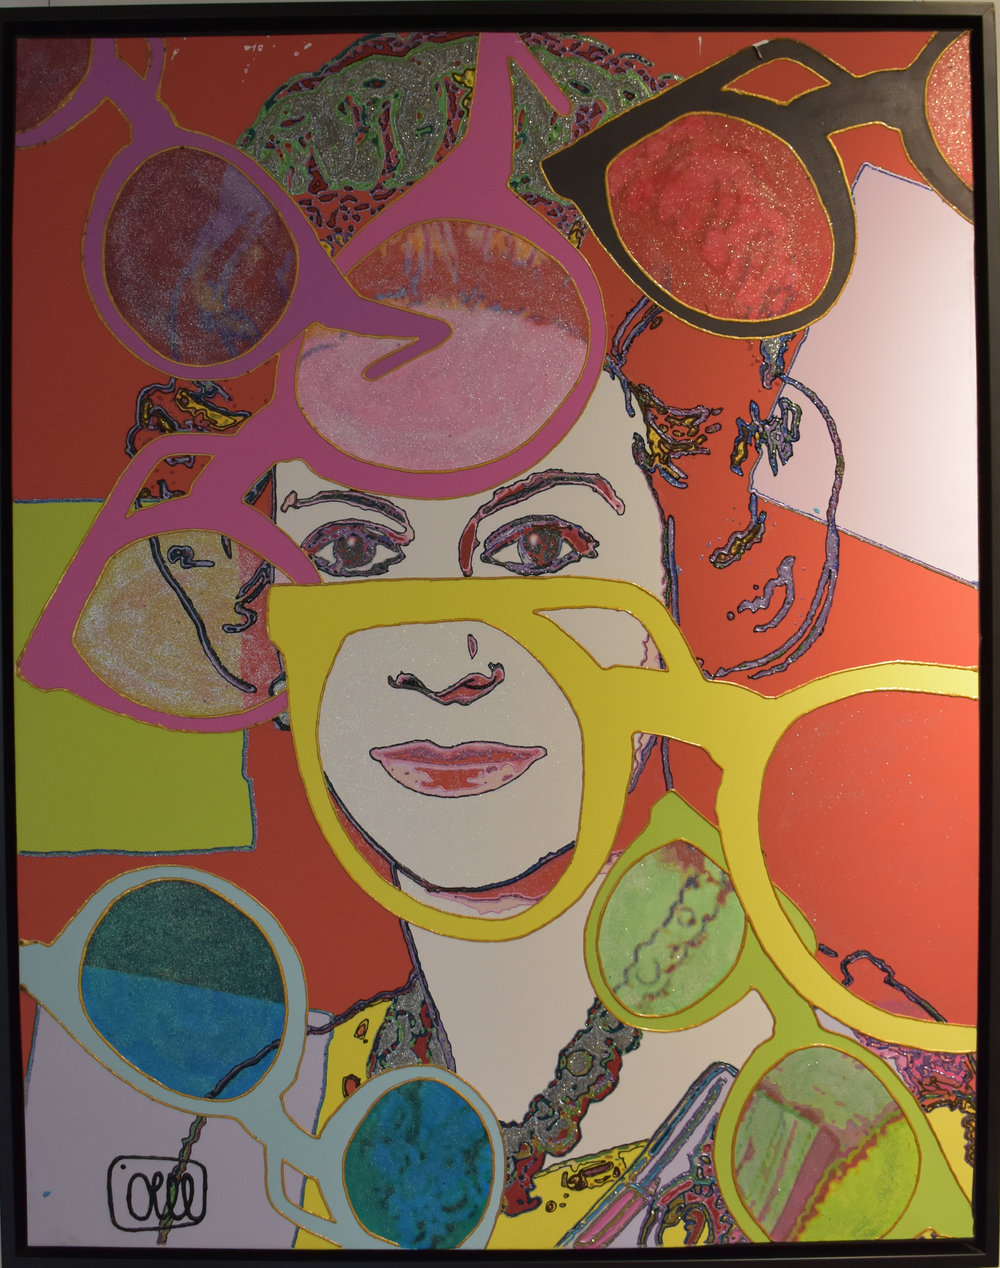 Queen Elizabeth - 2013Mixed media160 x 114 cm